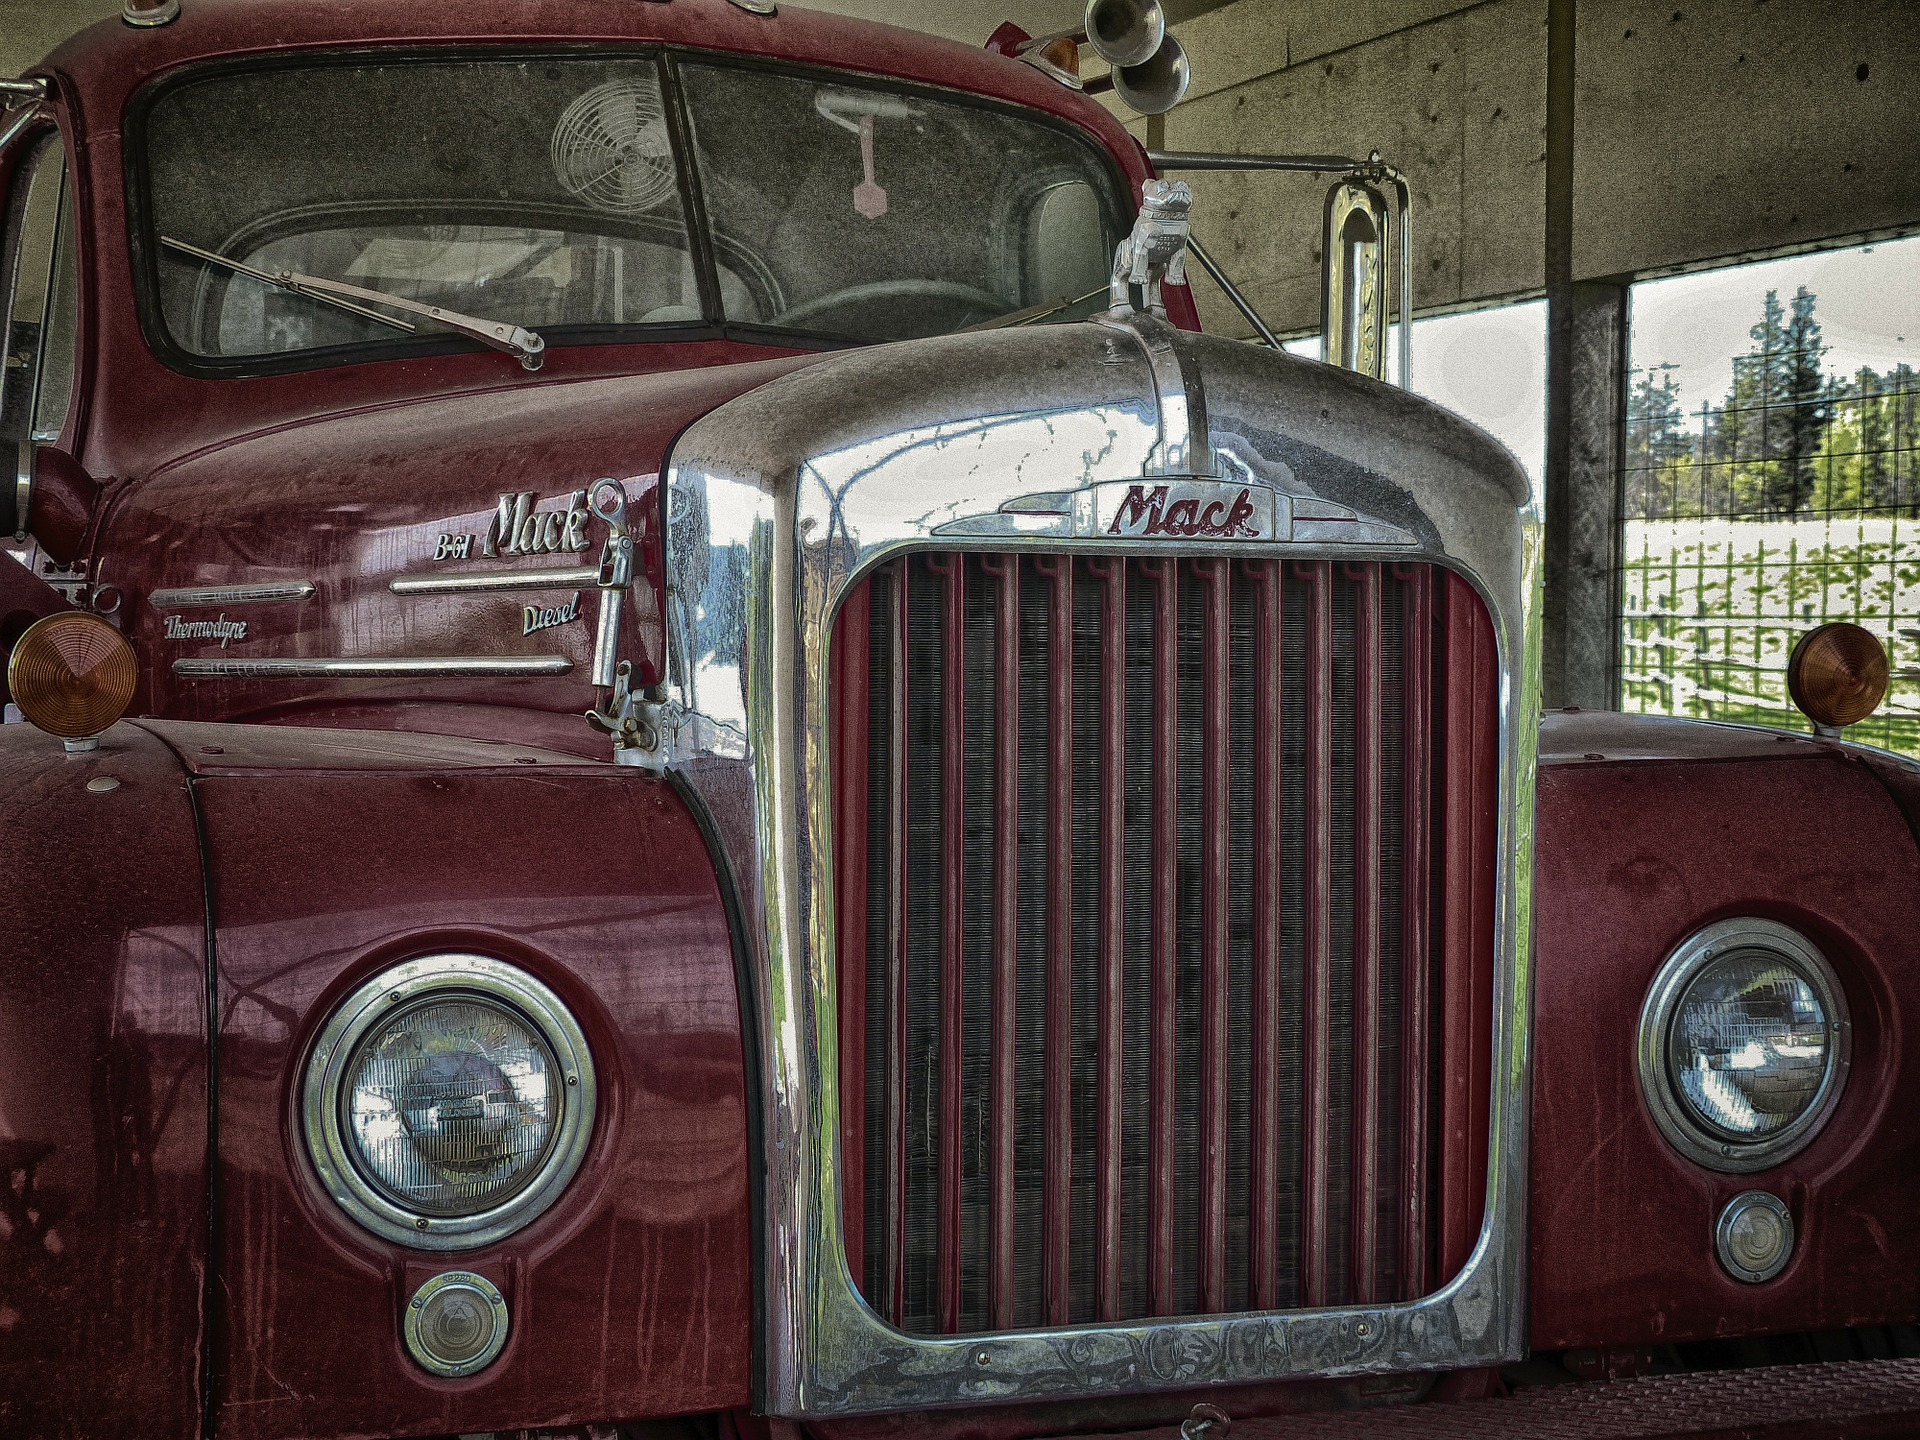 Mack Creates Fresh Comprehensive Look At Maintaining Trucks